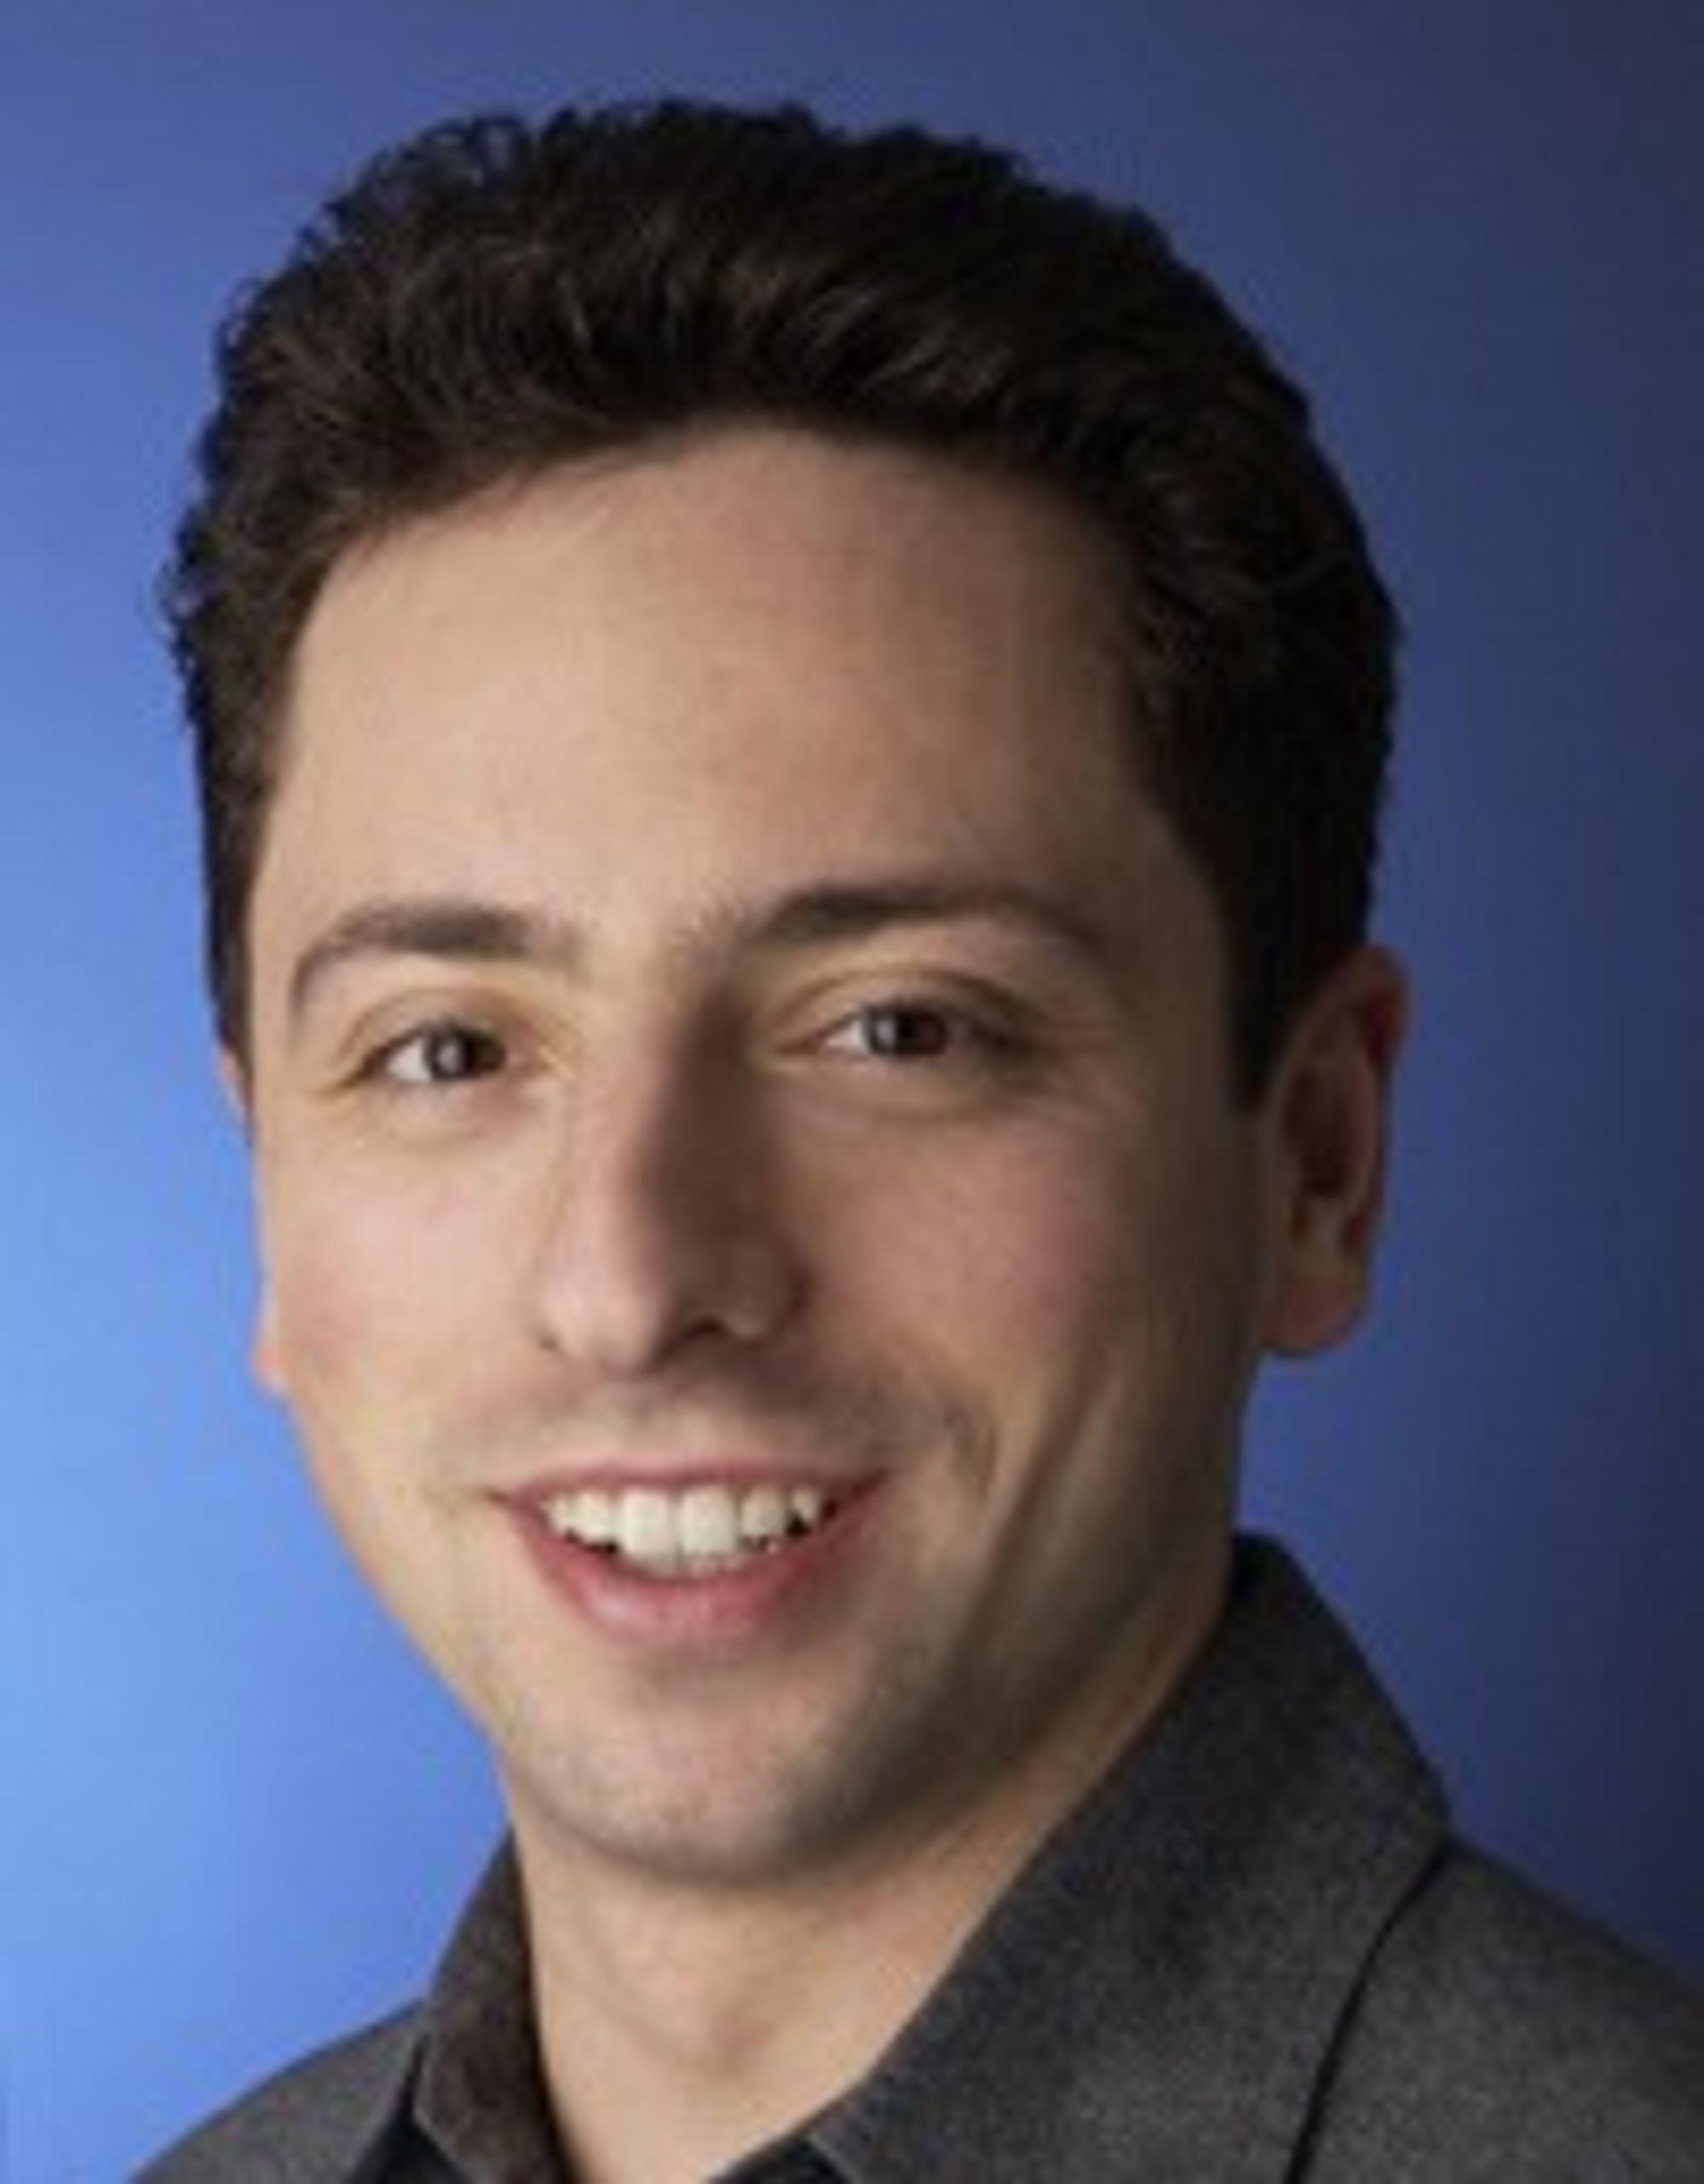 Medgründer i Google, Sergey Brin.